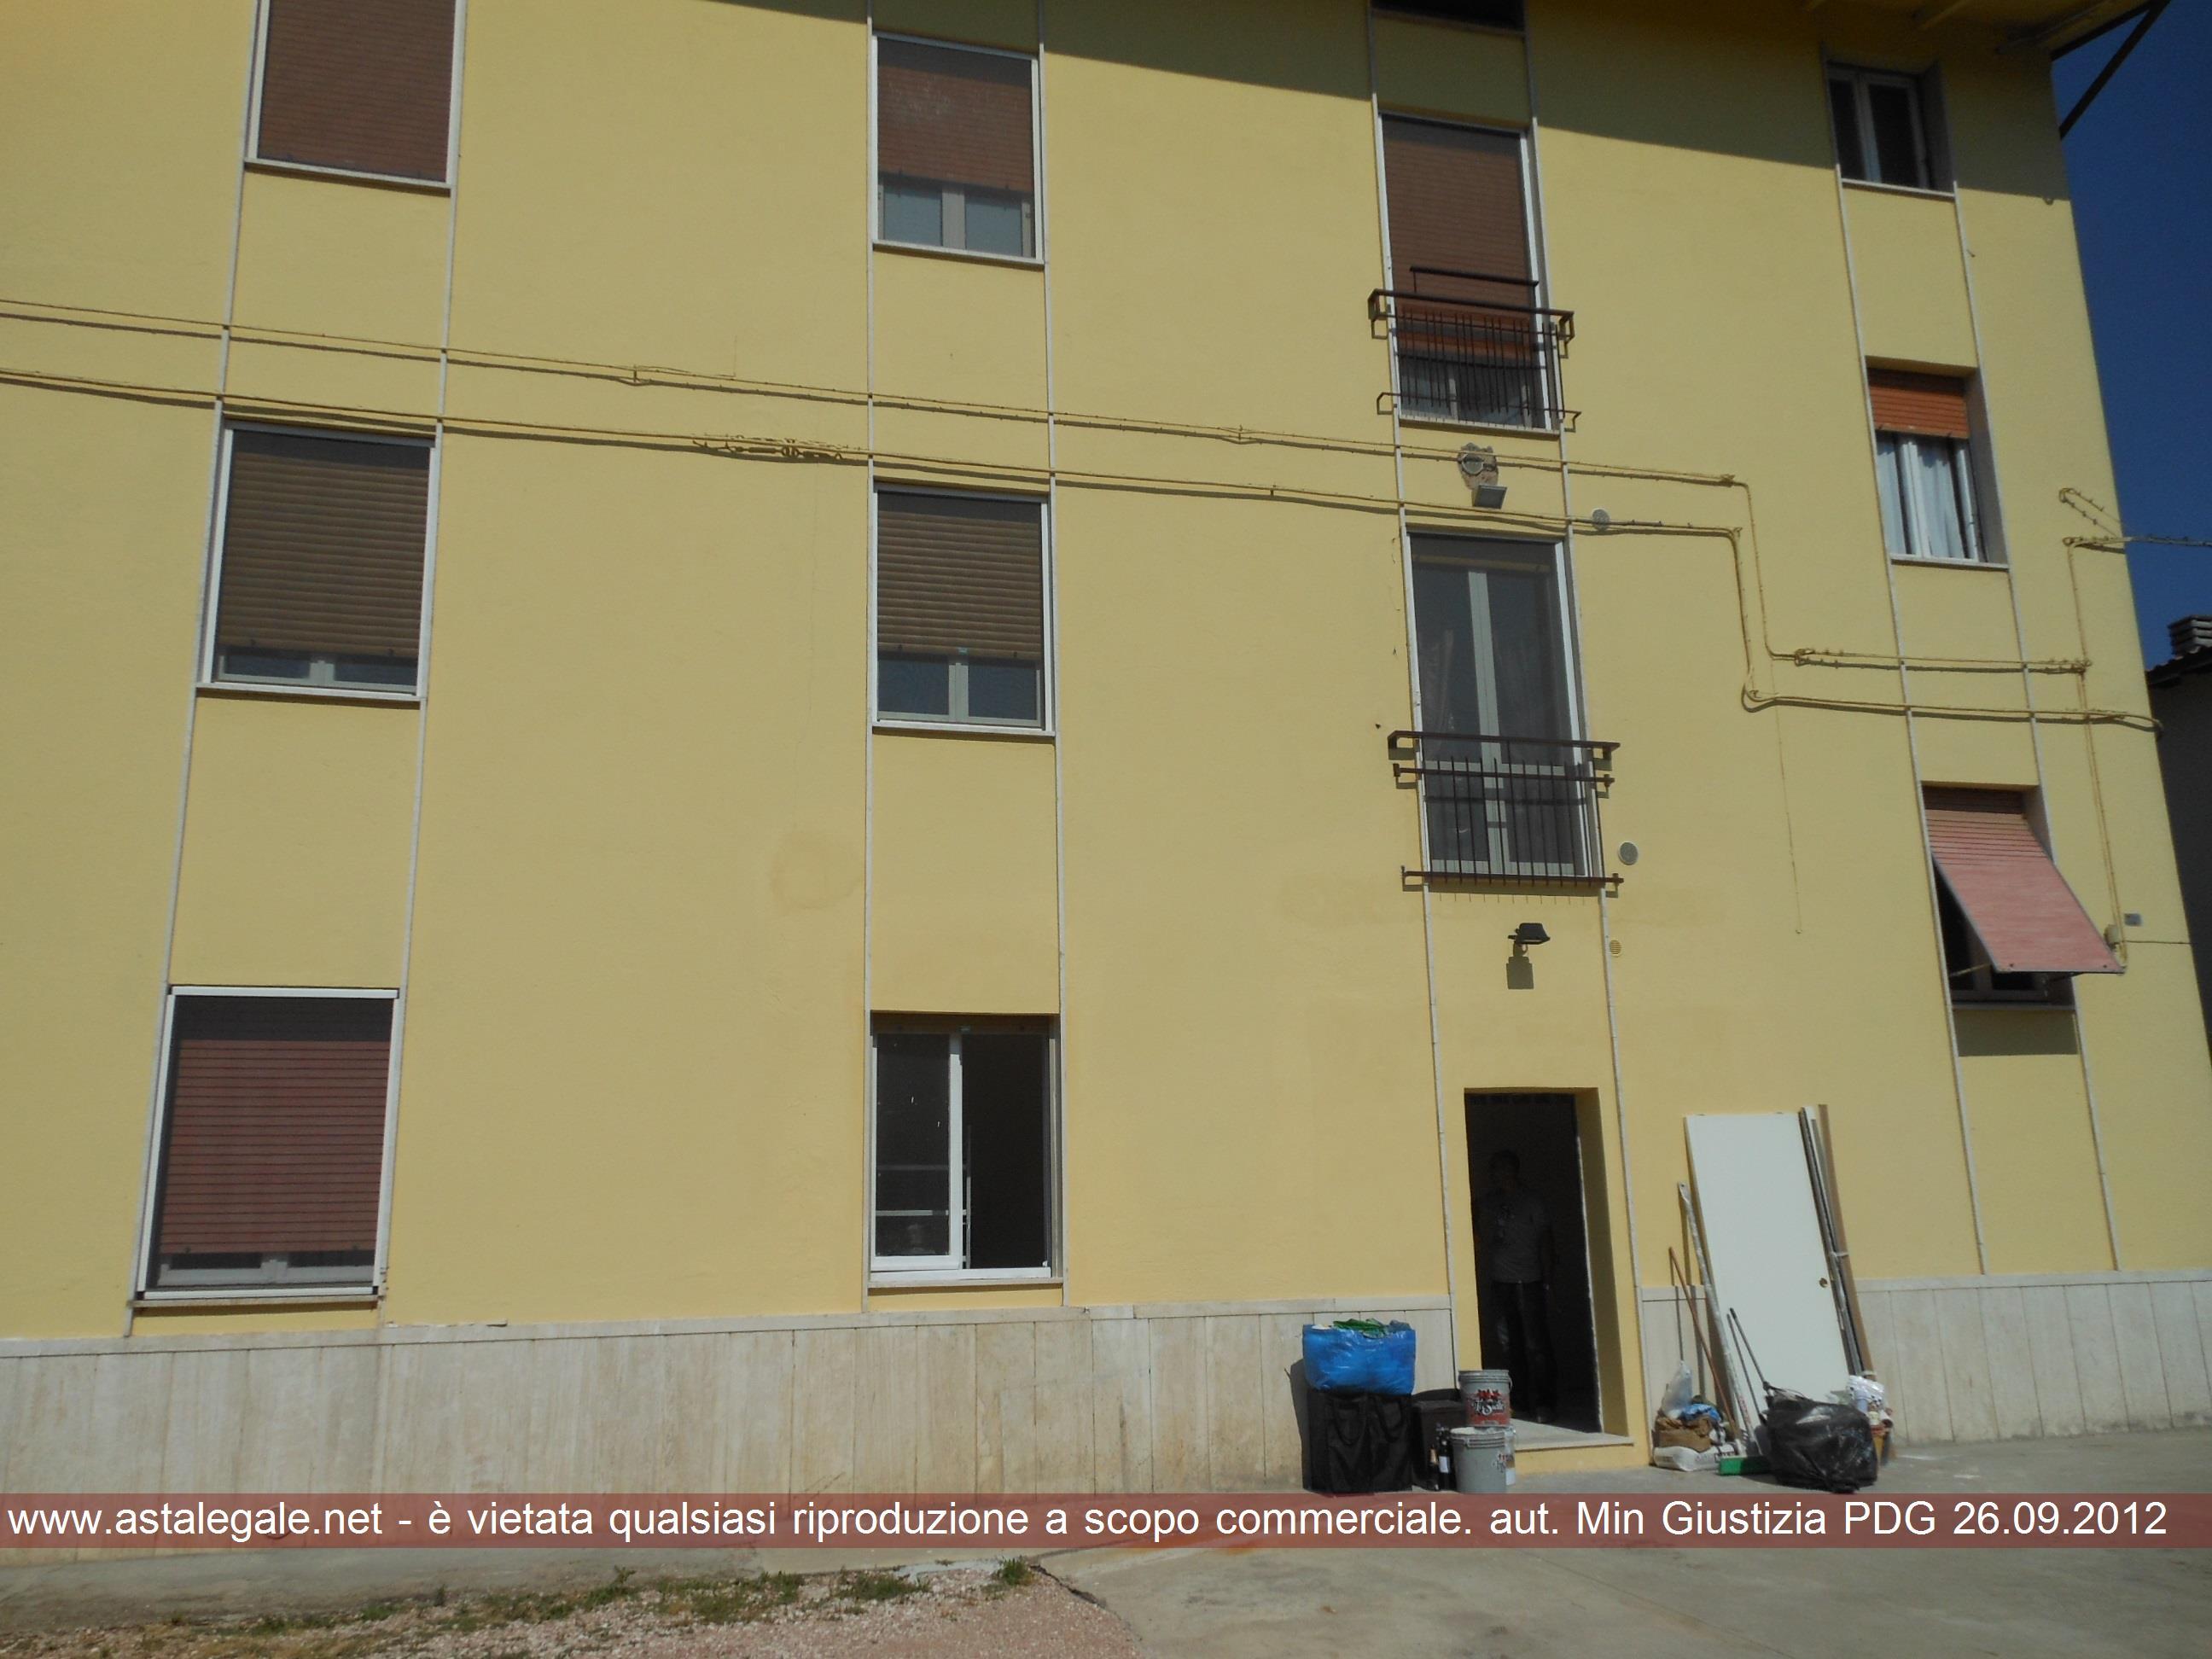 Assisi (PG) Localita' Petrignano - Via Sassaiola 9